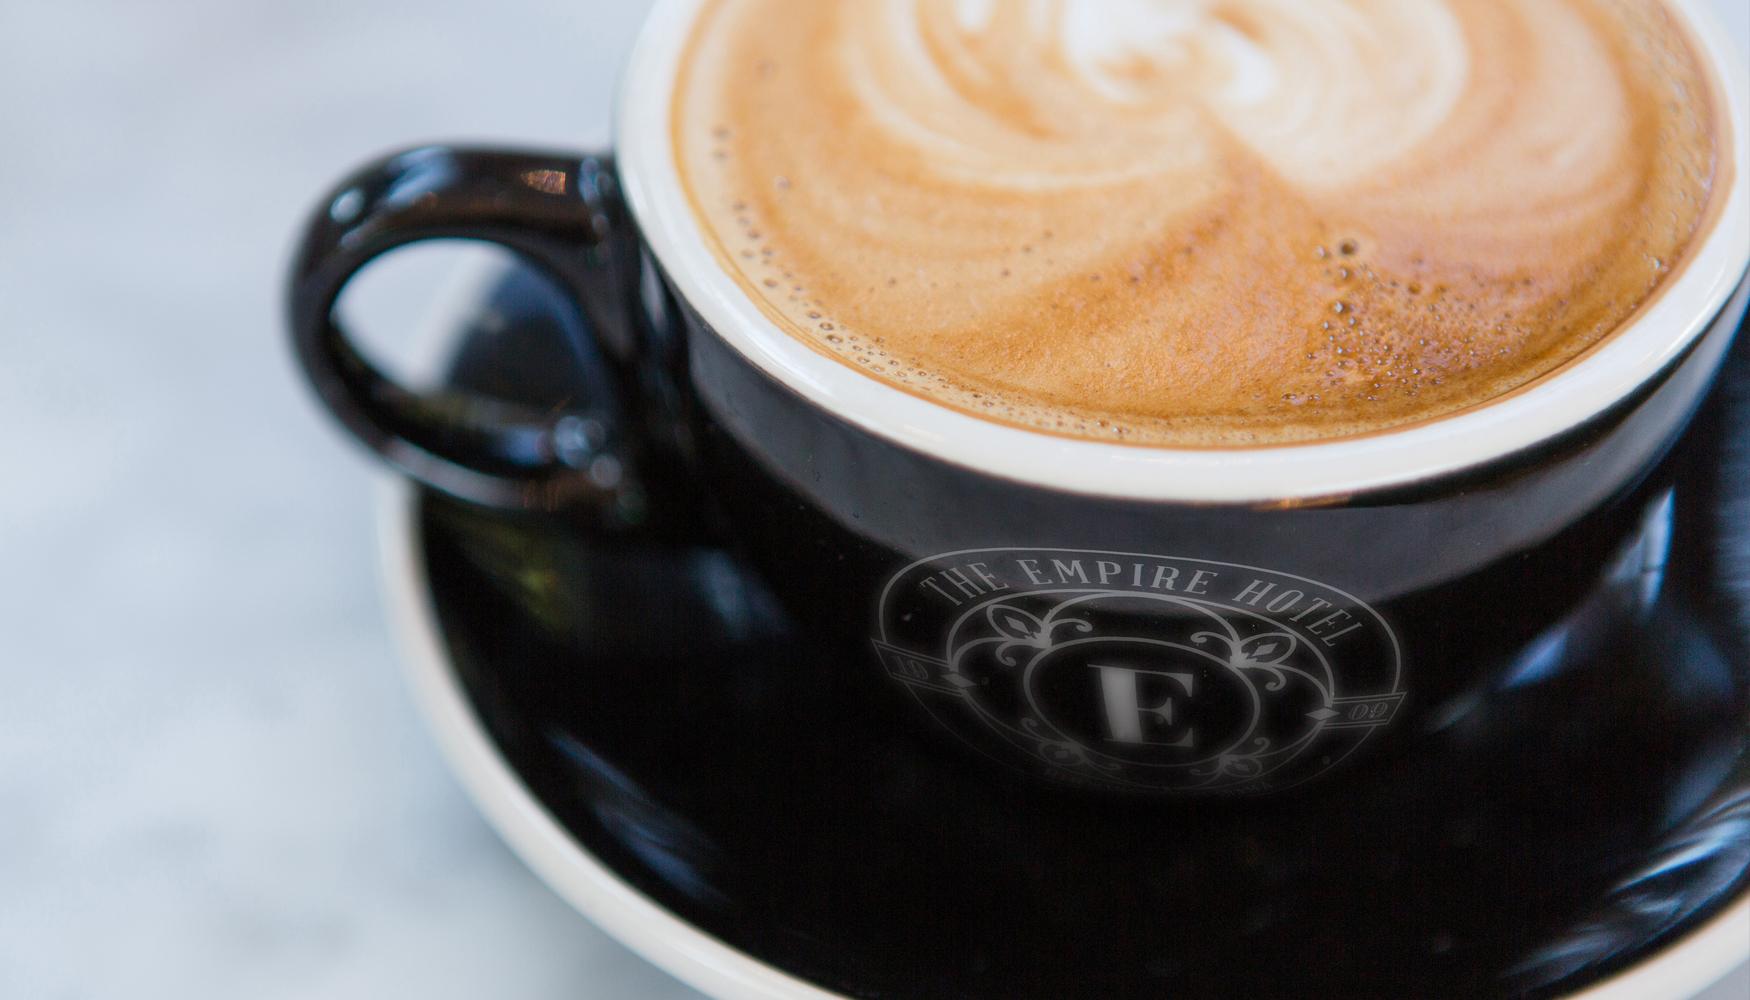 Empire_Coffee.jpg